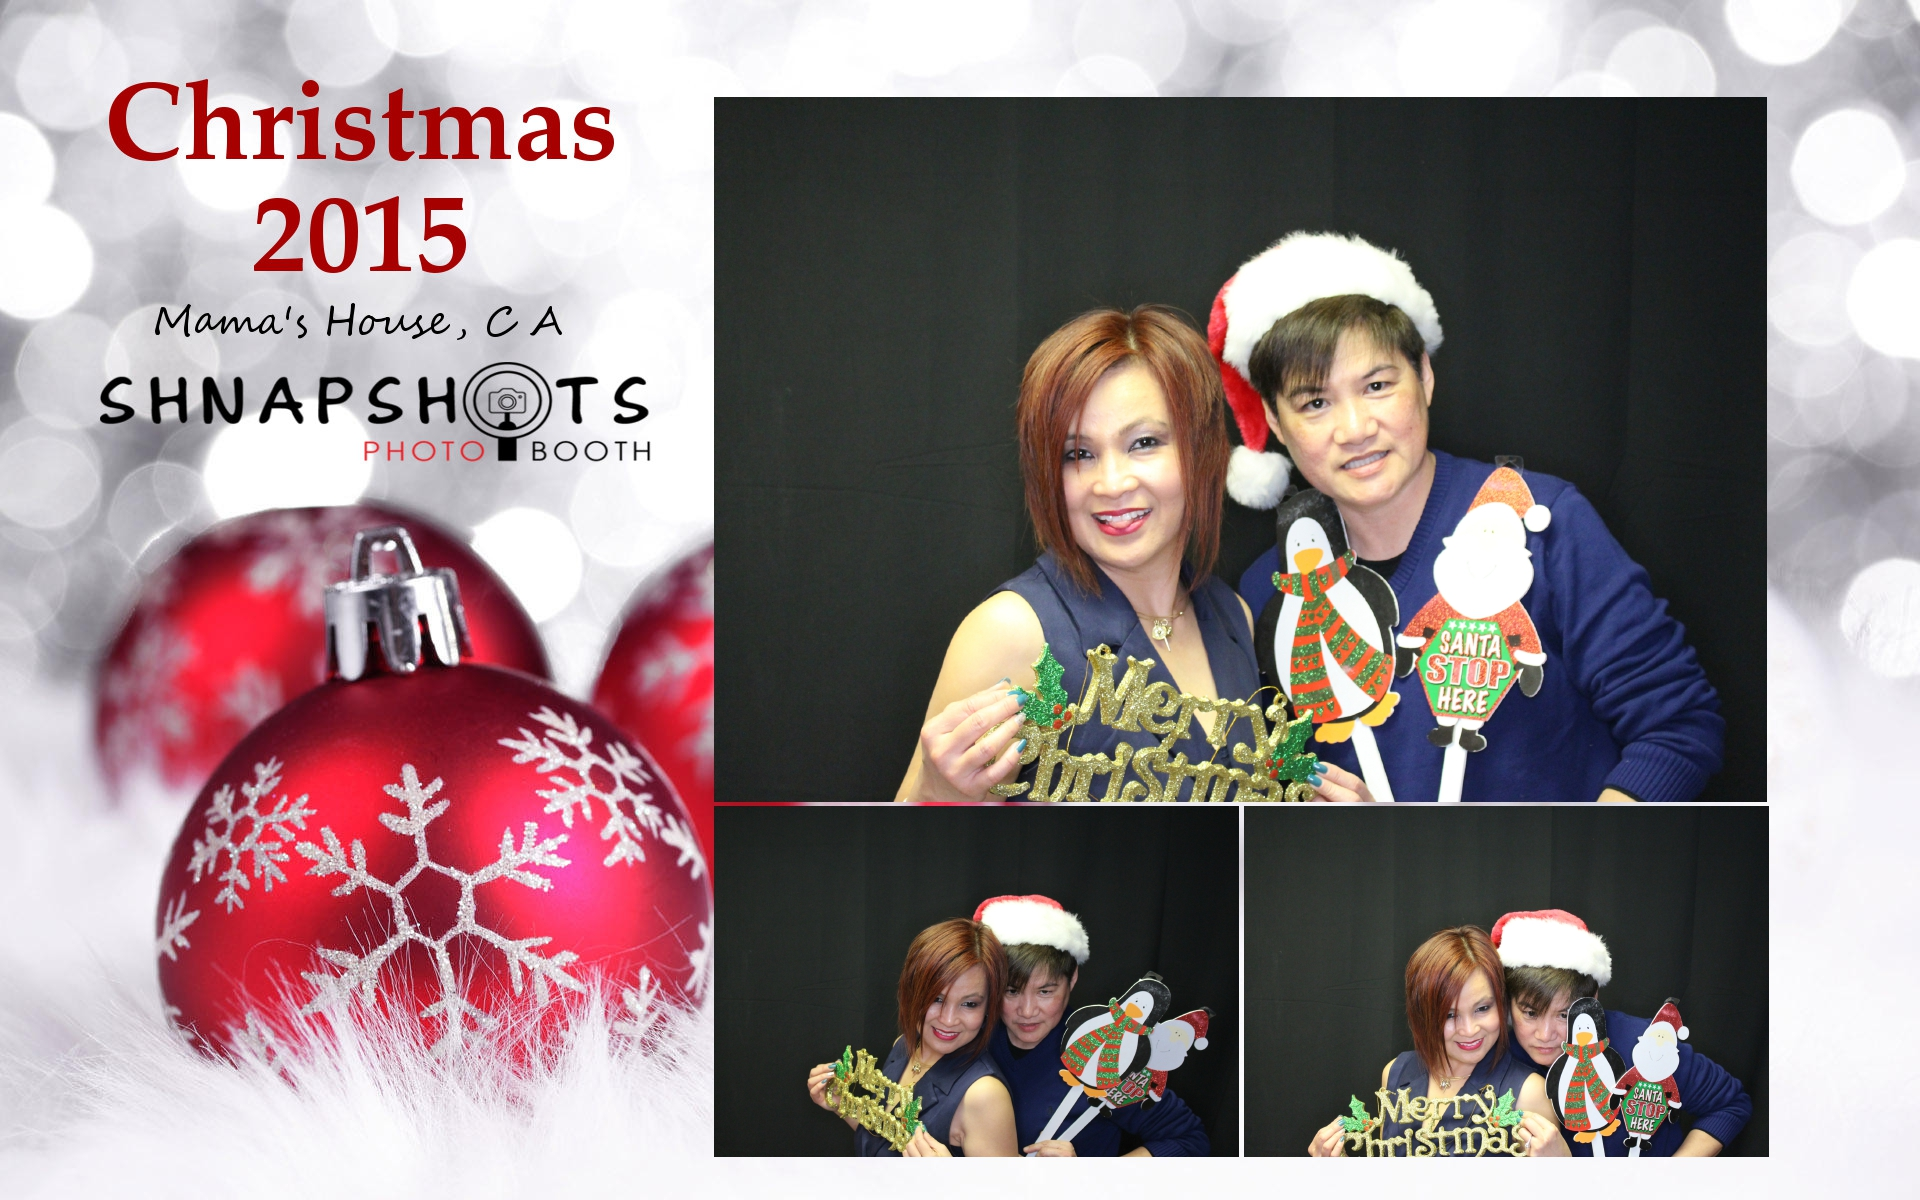 Christmas 2015 - December 25, 2015